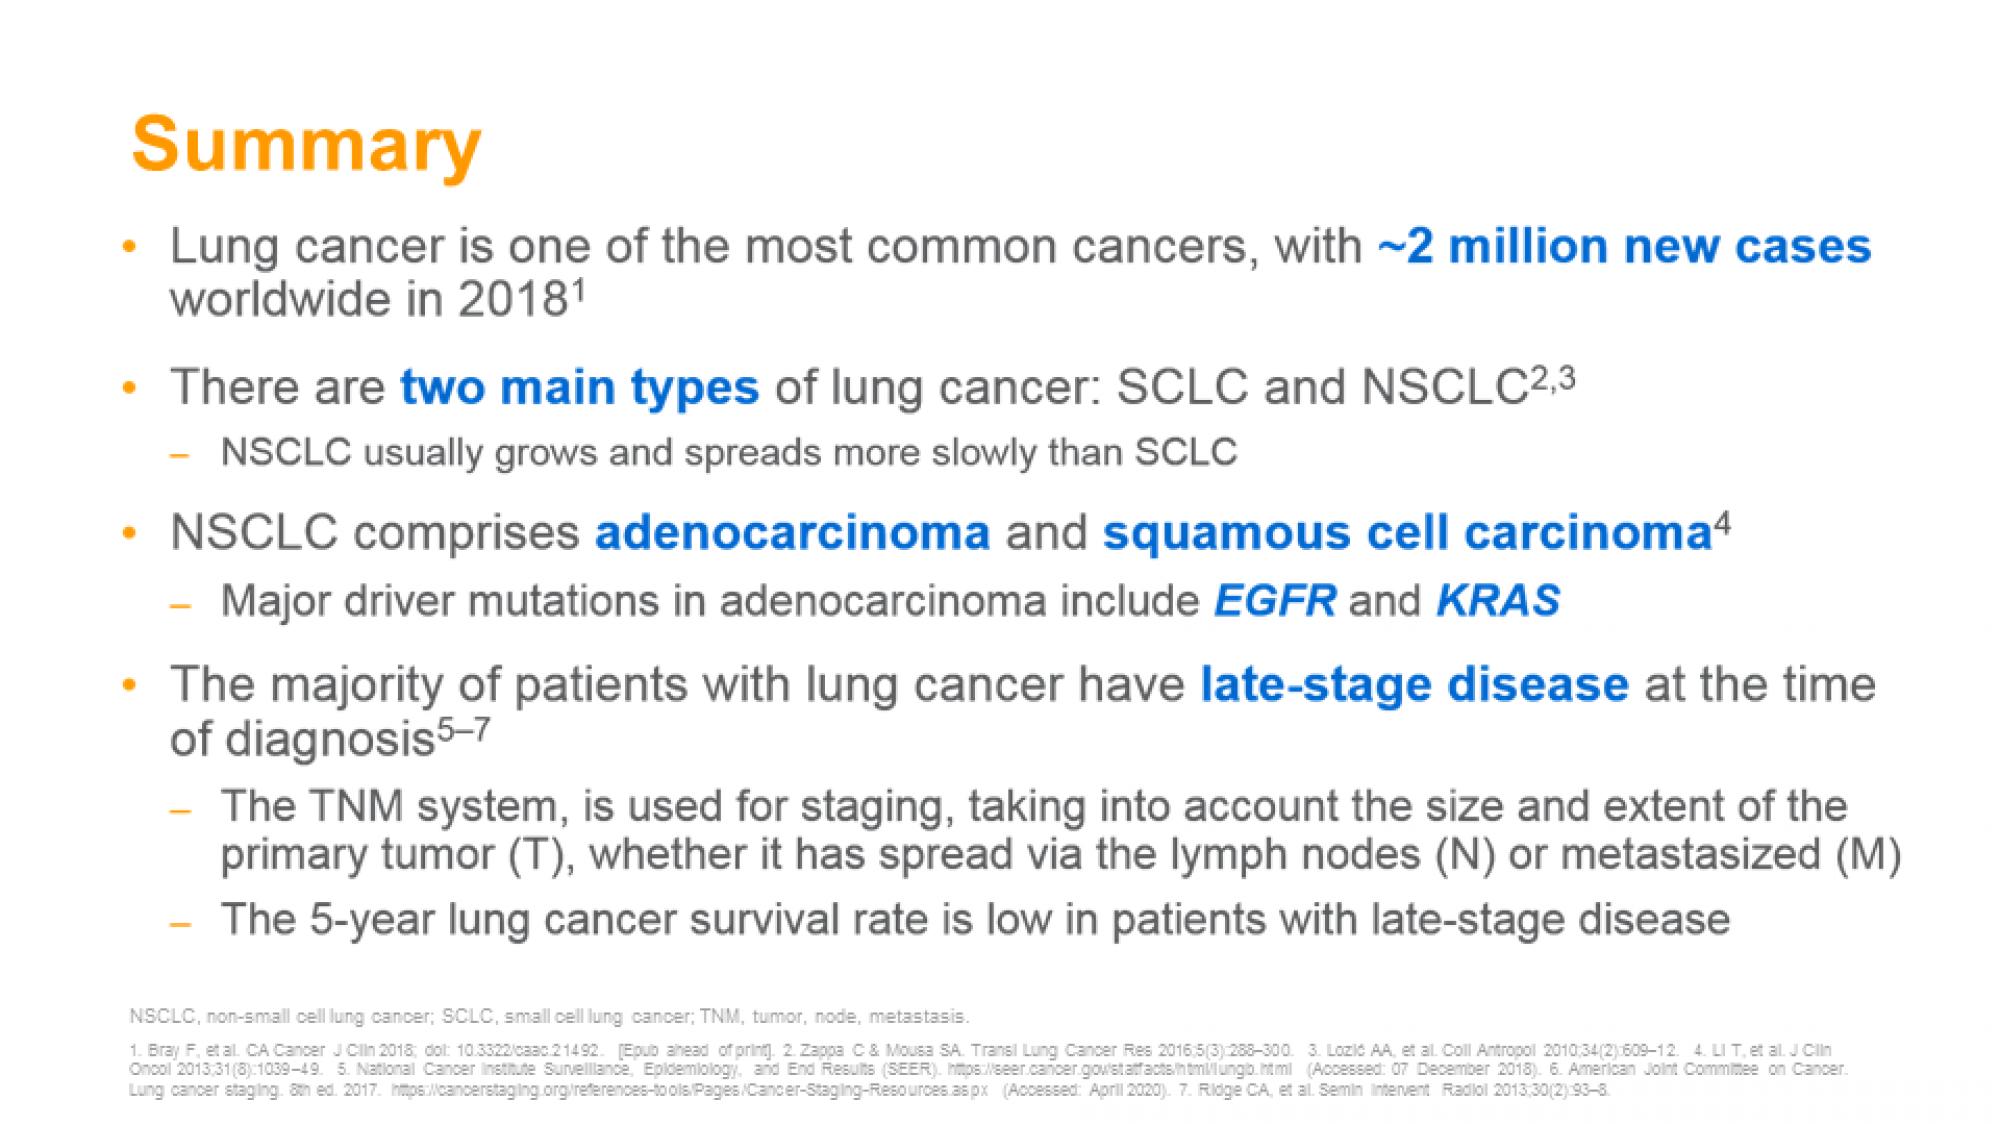 NSCLC ch1 slide 17